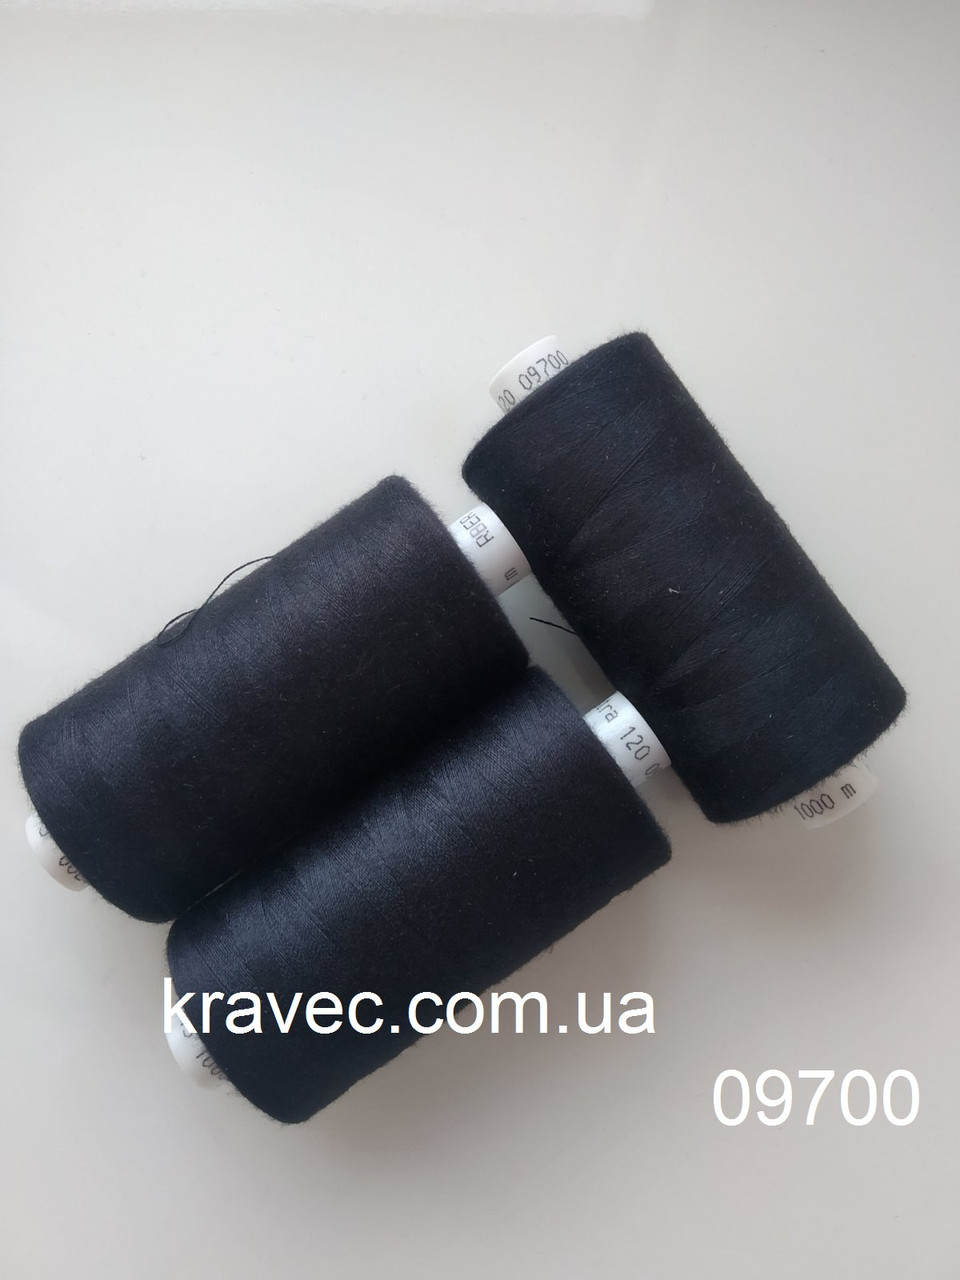 Нитки Coats Astra  120/09700/1000м